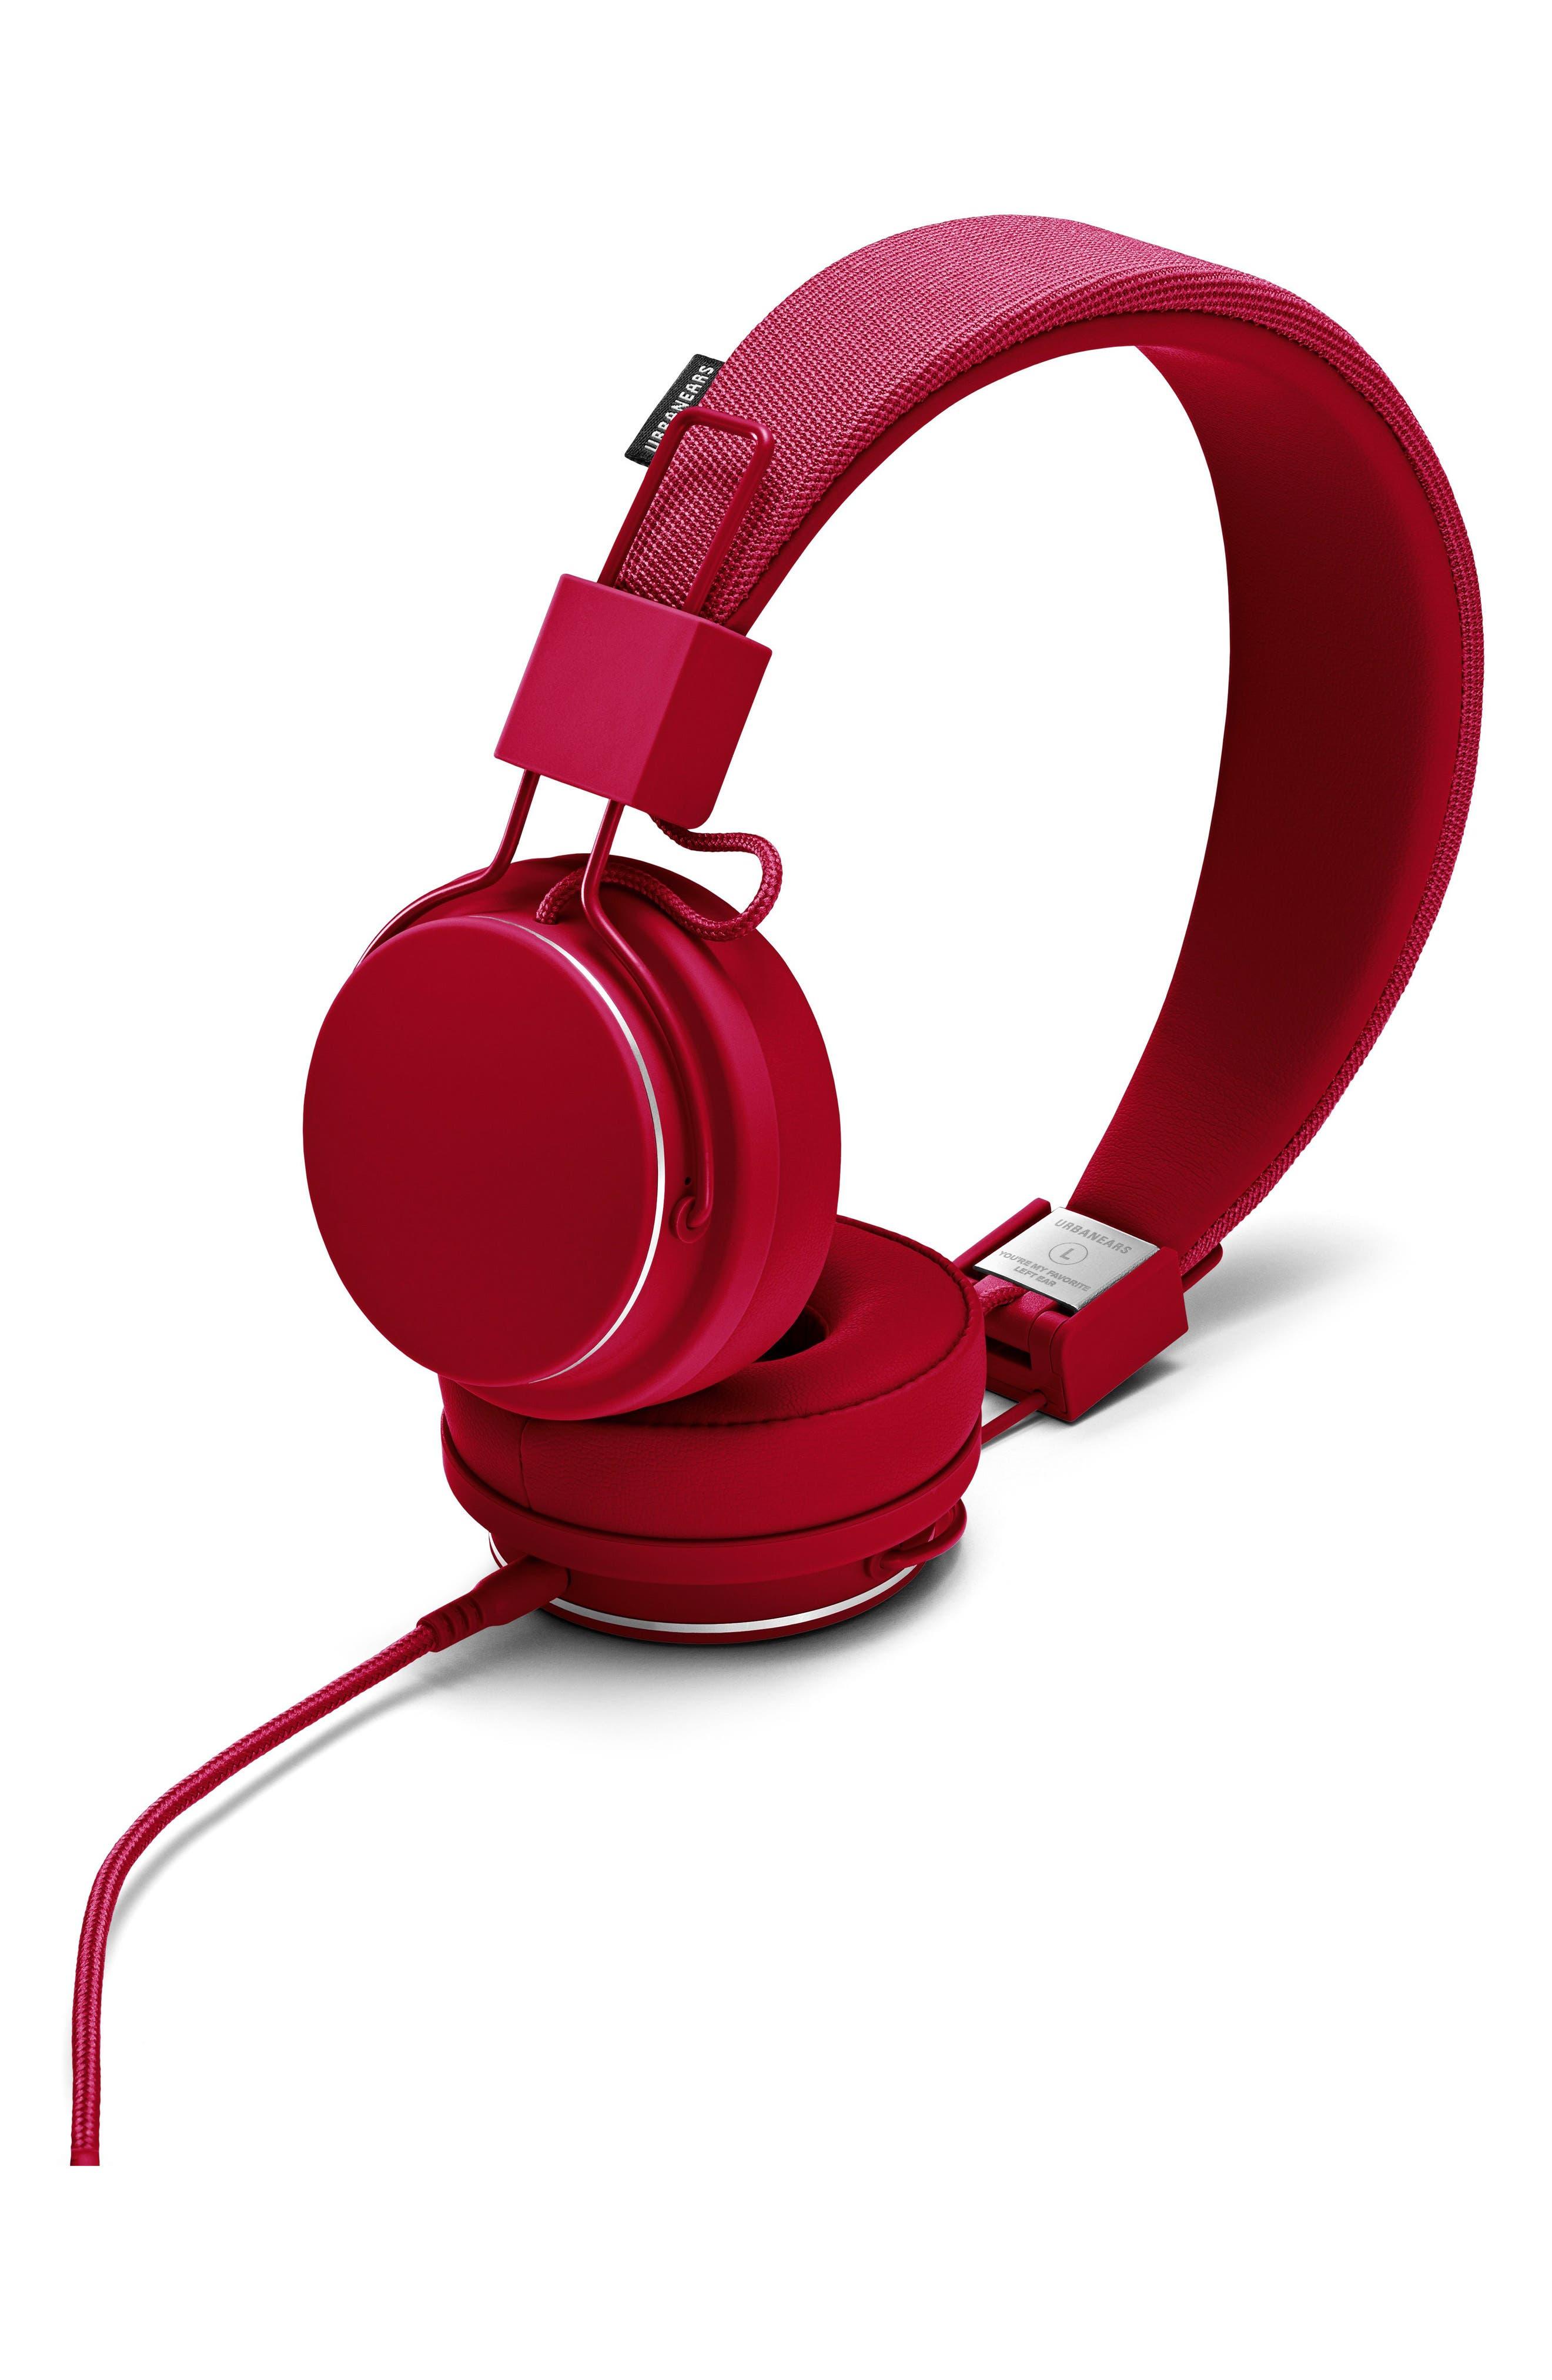 Plattan II On-Ear Headphones,                             Main thumbnail 1, color,                             Beryl Red